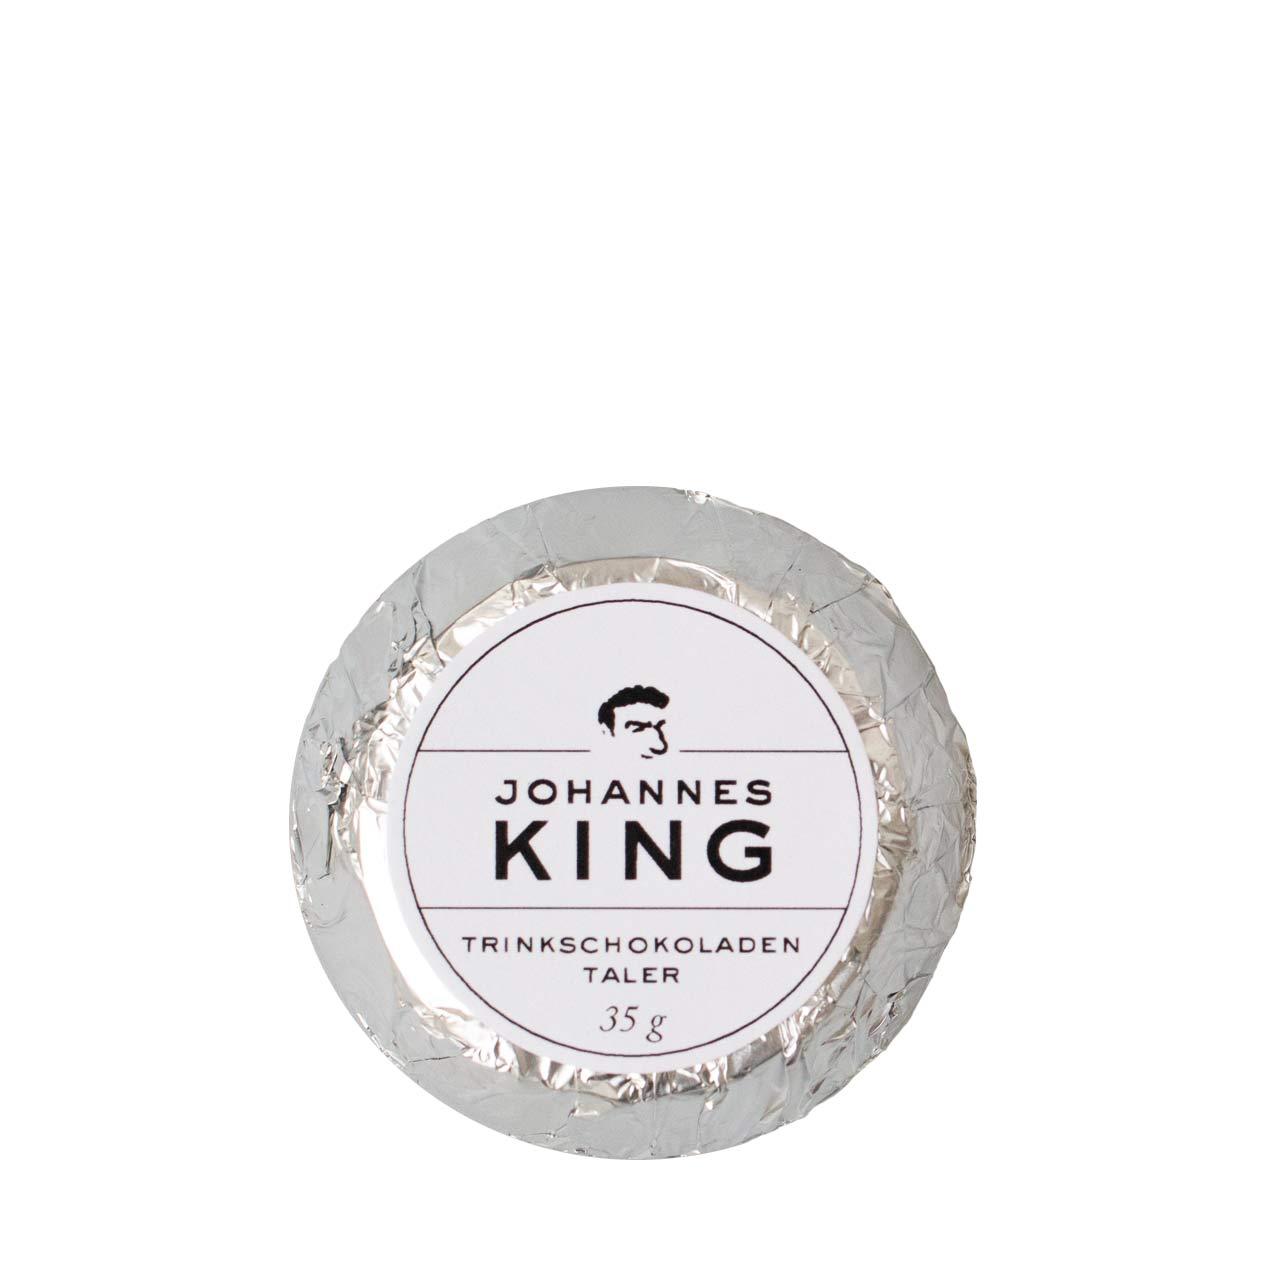 Kings Trinkschokoladen-Taler